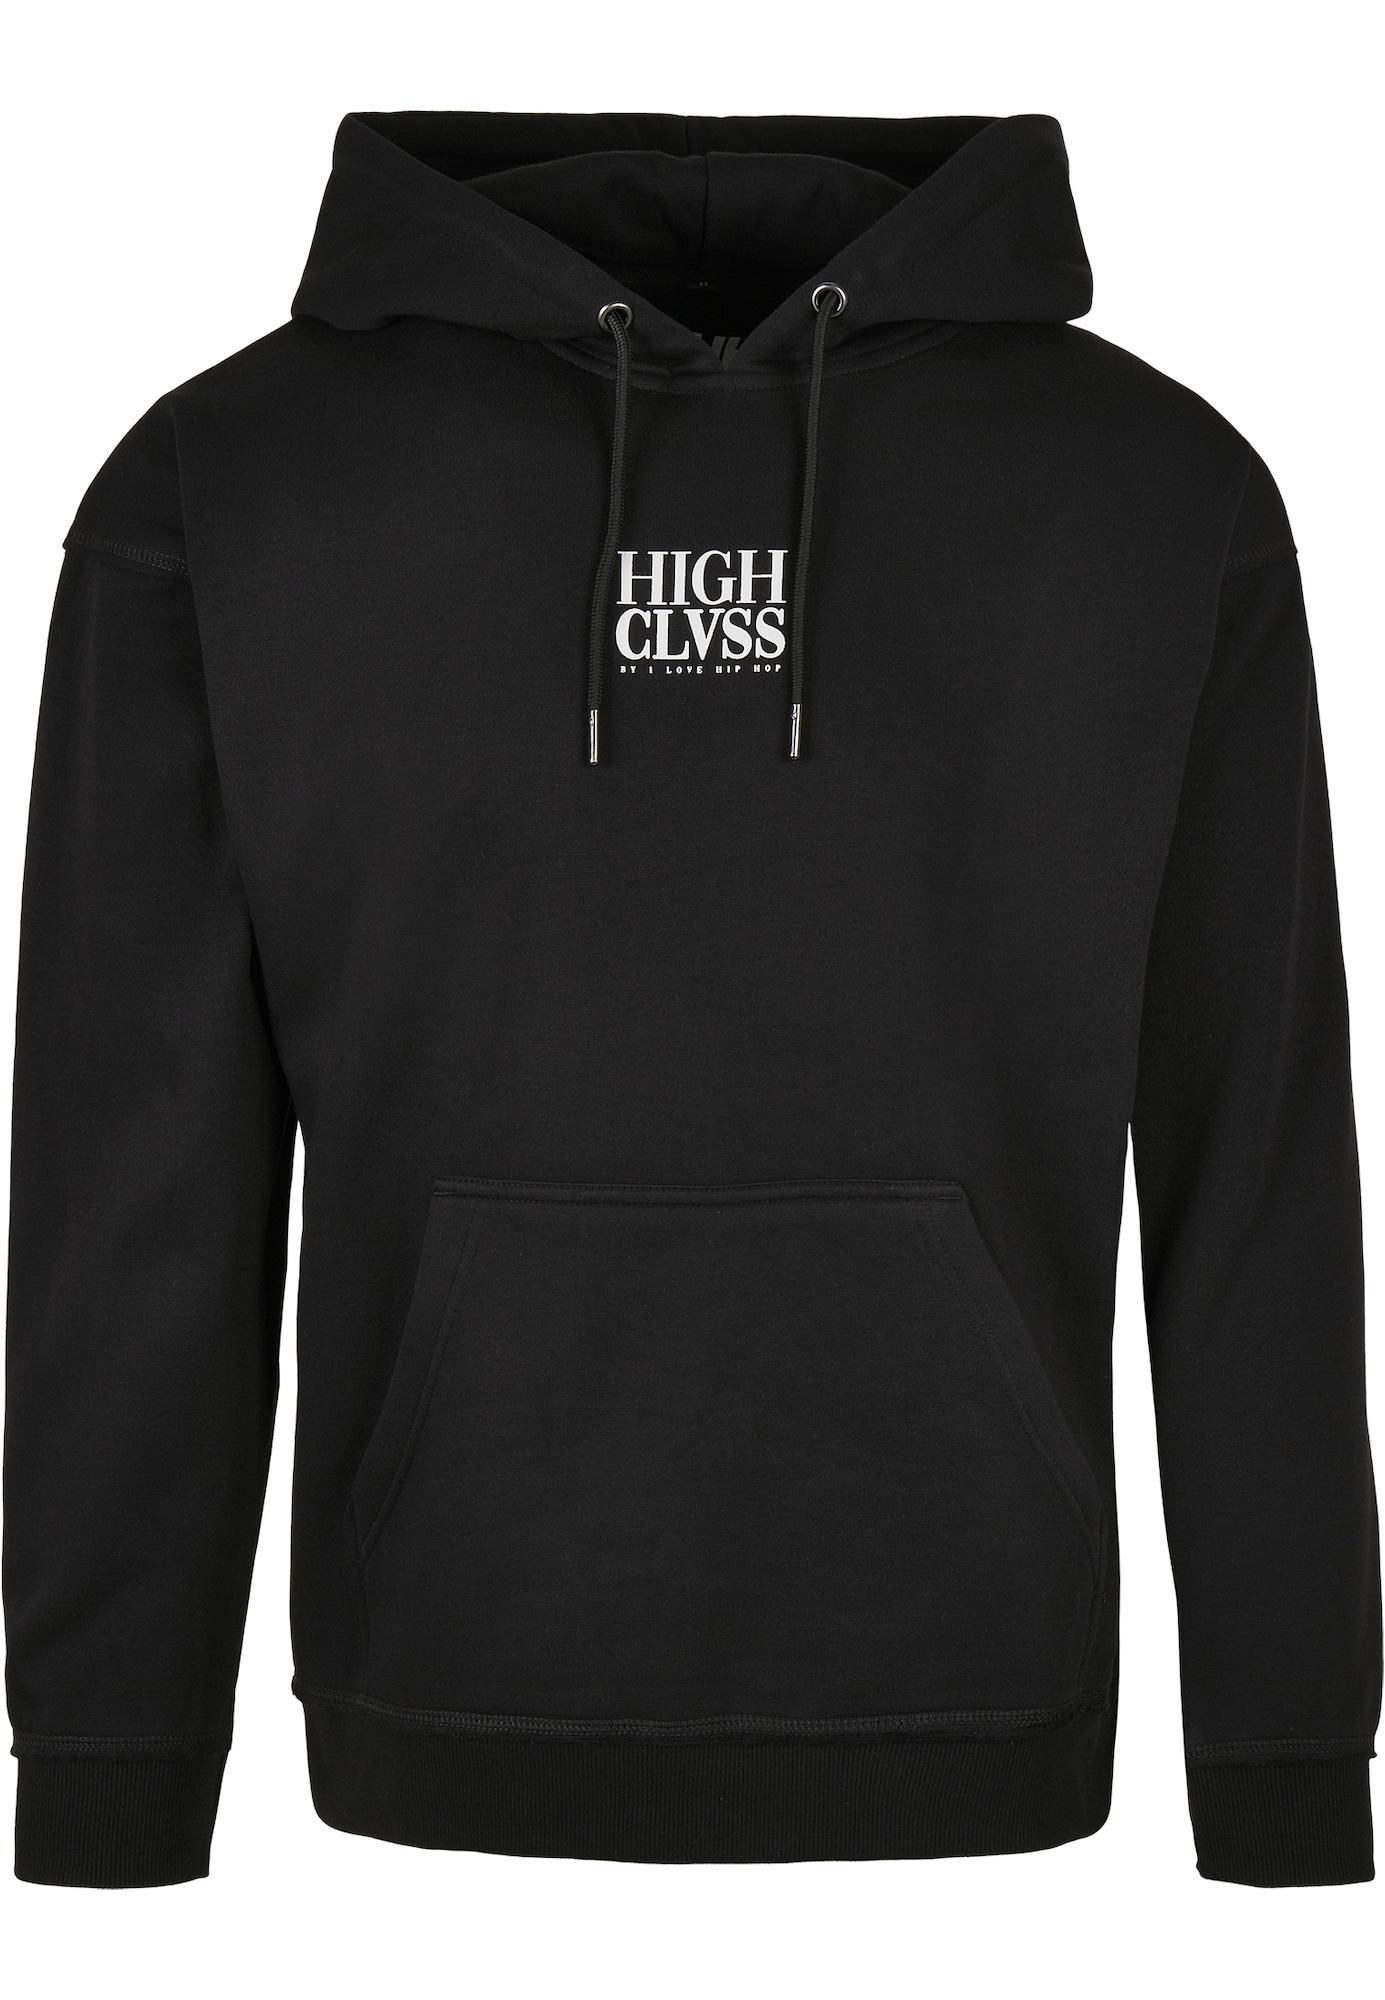 Sweatshirt ILHH